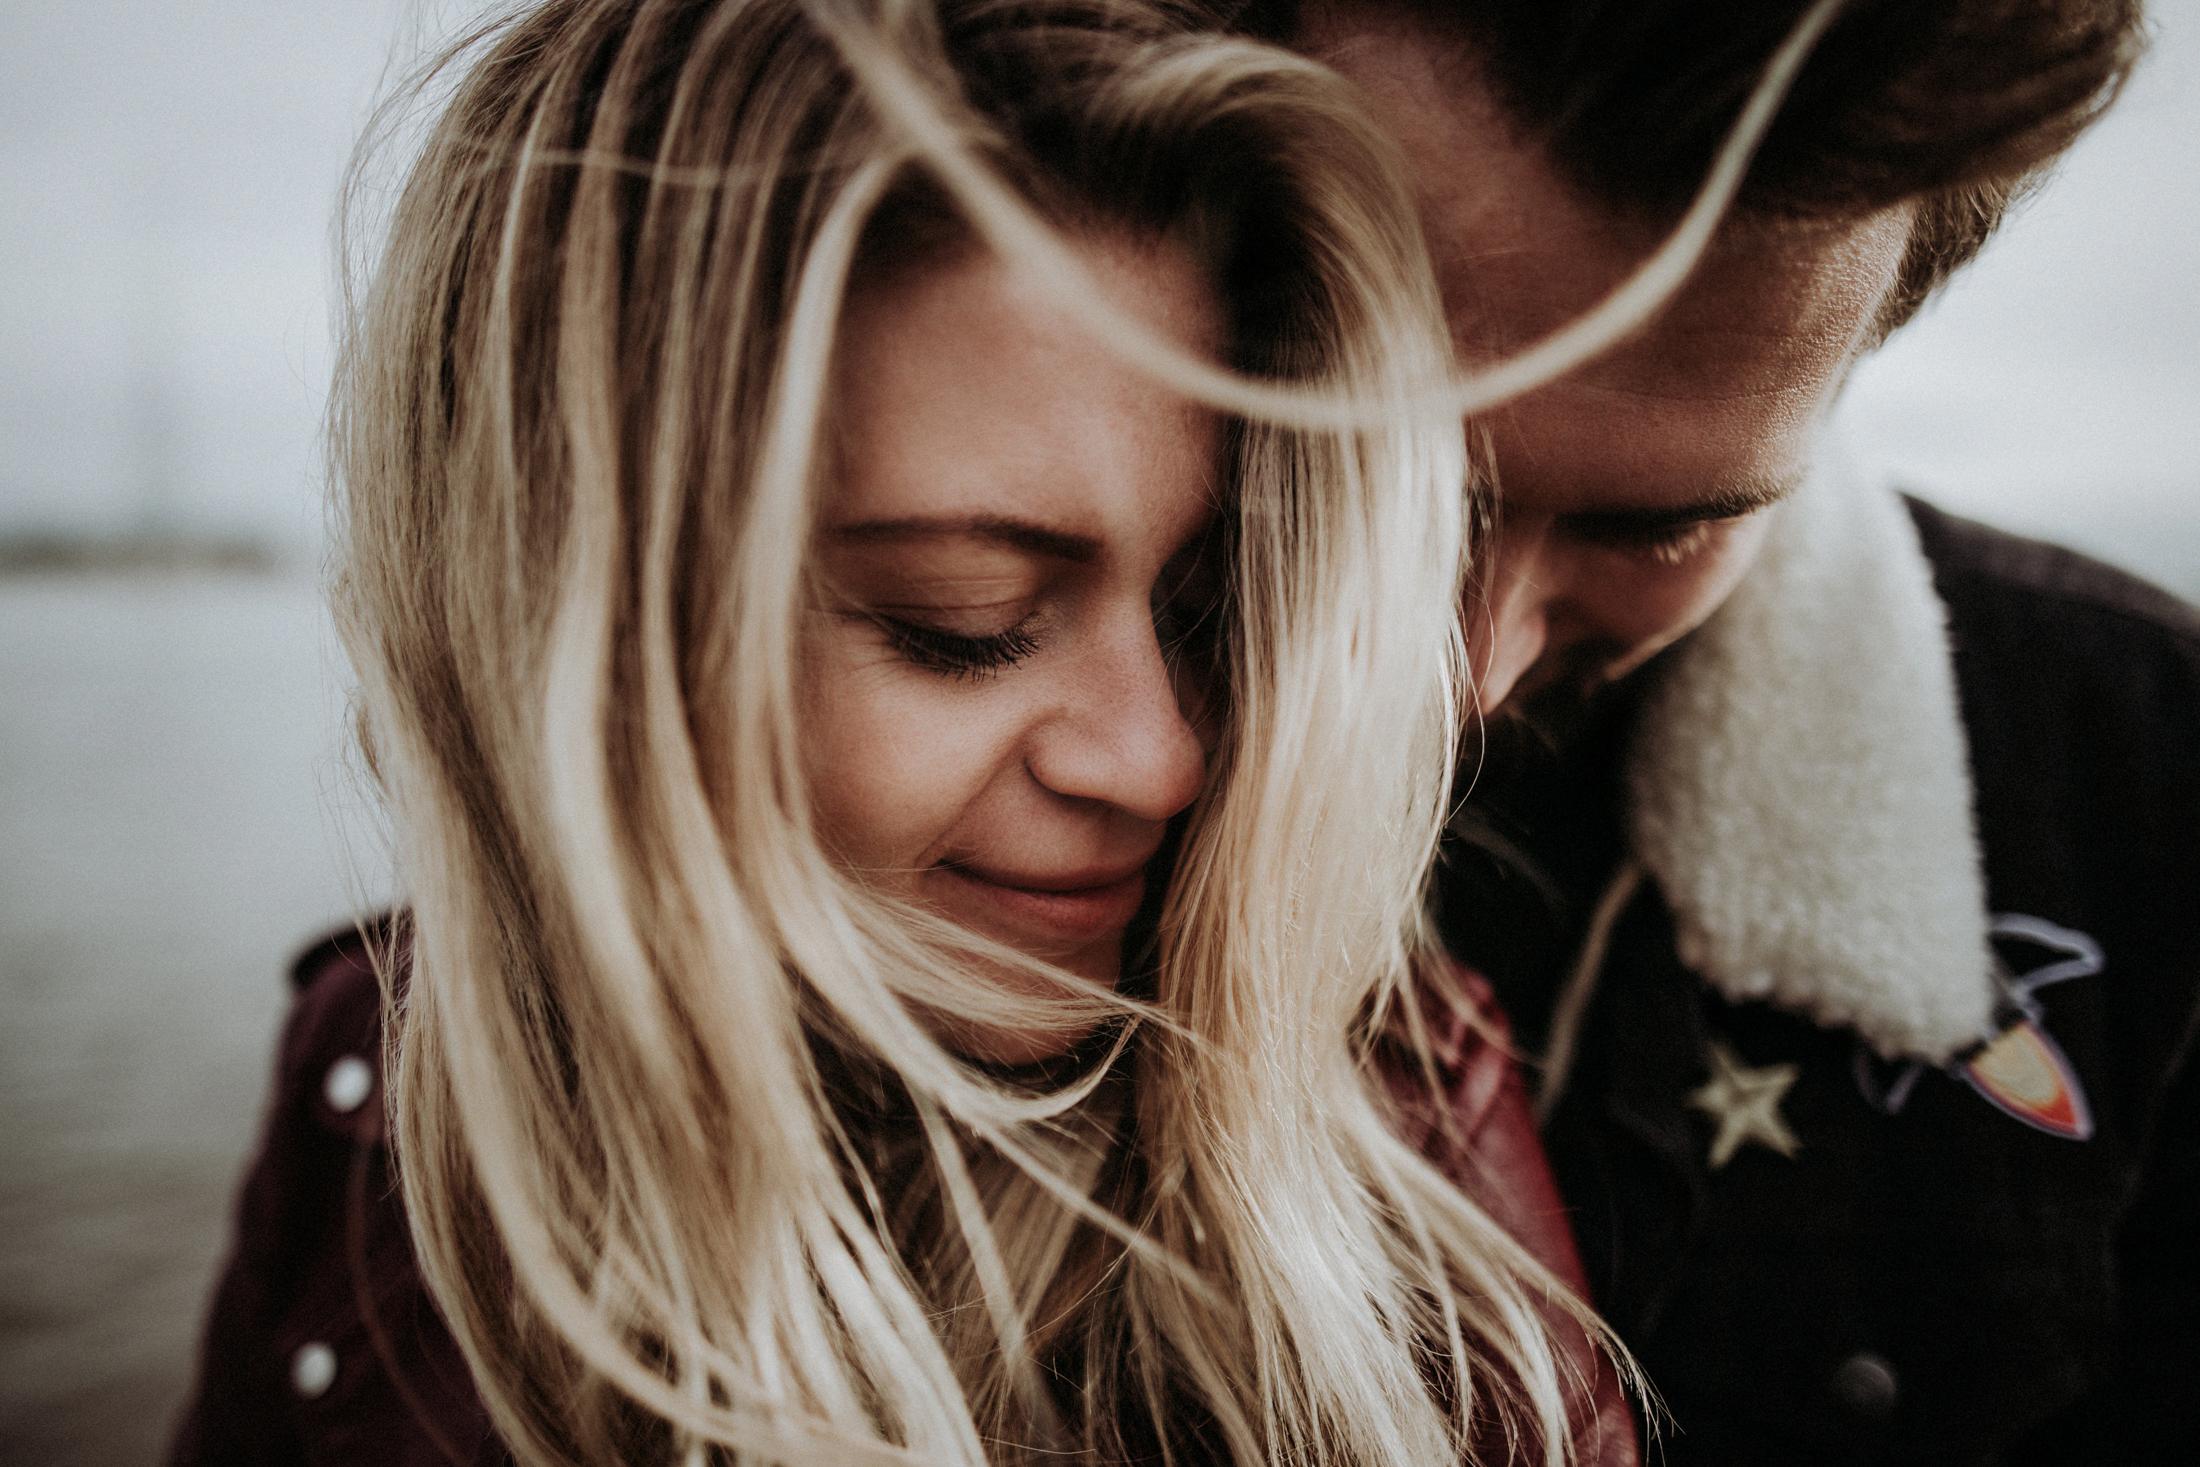 Wedding_Photographer_Mallorca_DanielaMarquardt_Photography_CanaryIslands_Lanzarote_Iceland_Tuscany_Santorini_Portugal_NewYork_Spain_Elopement_Hochzeitsfotograf_CK88